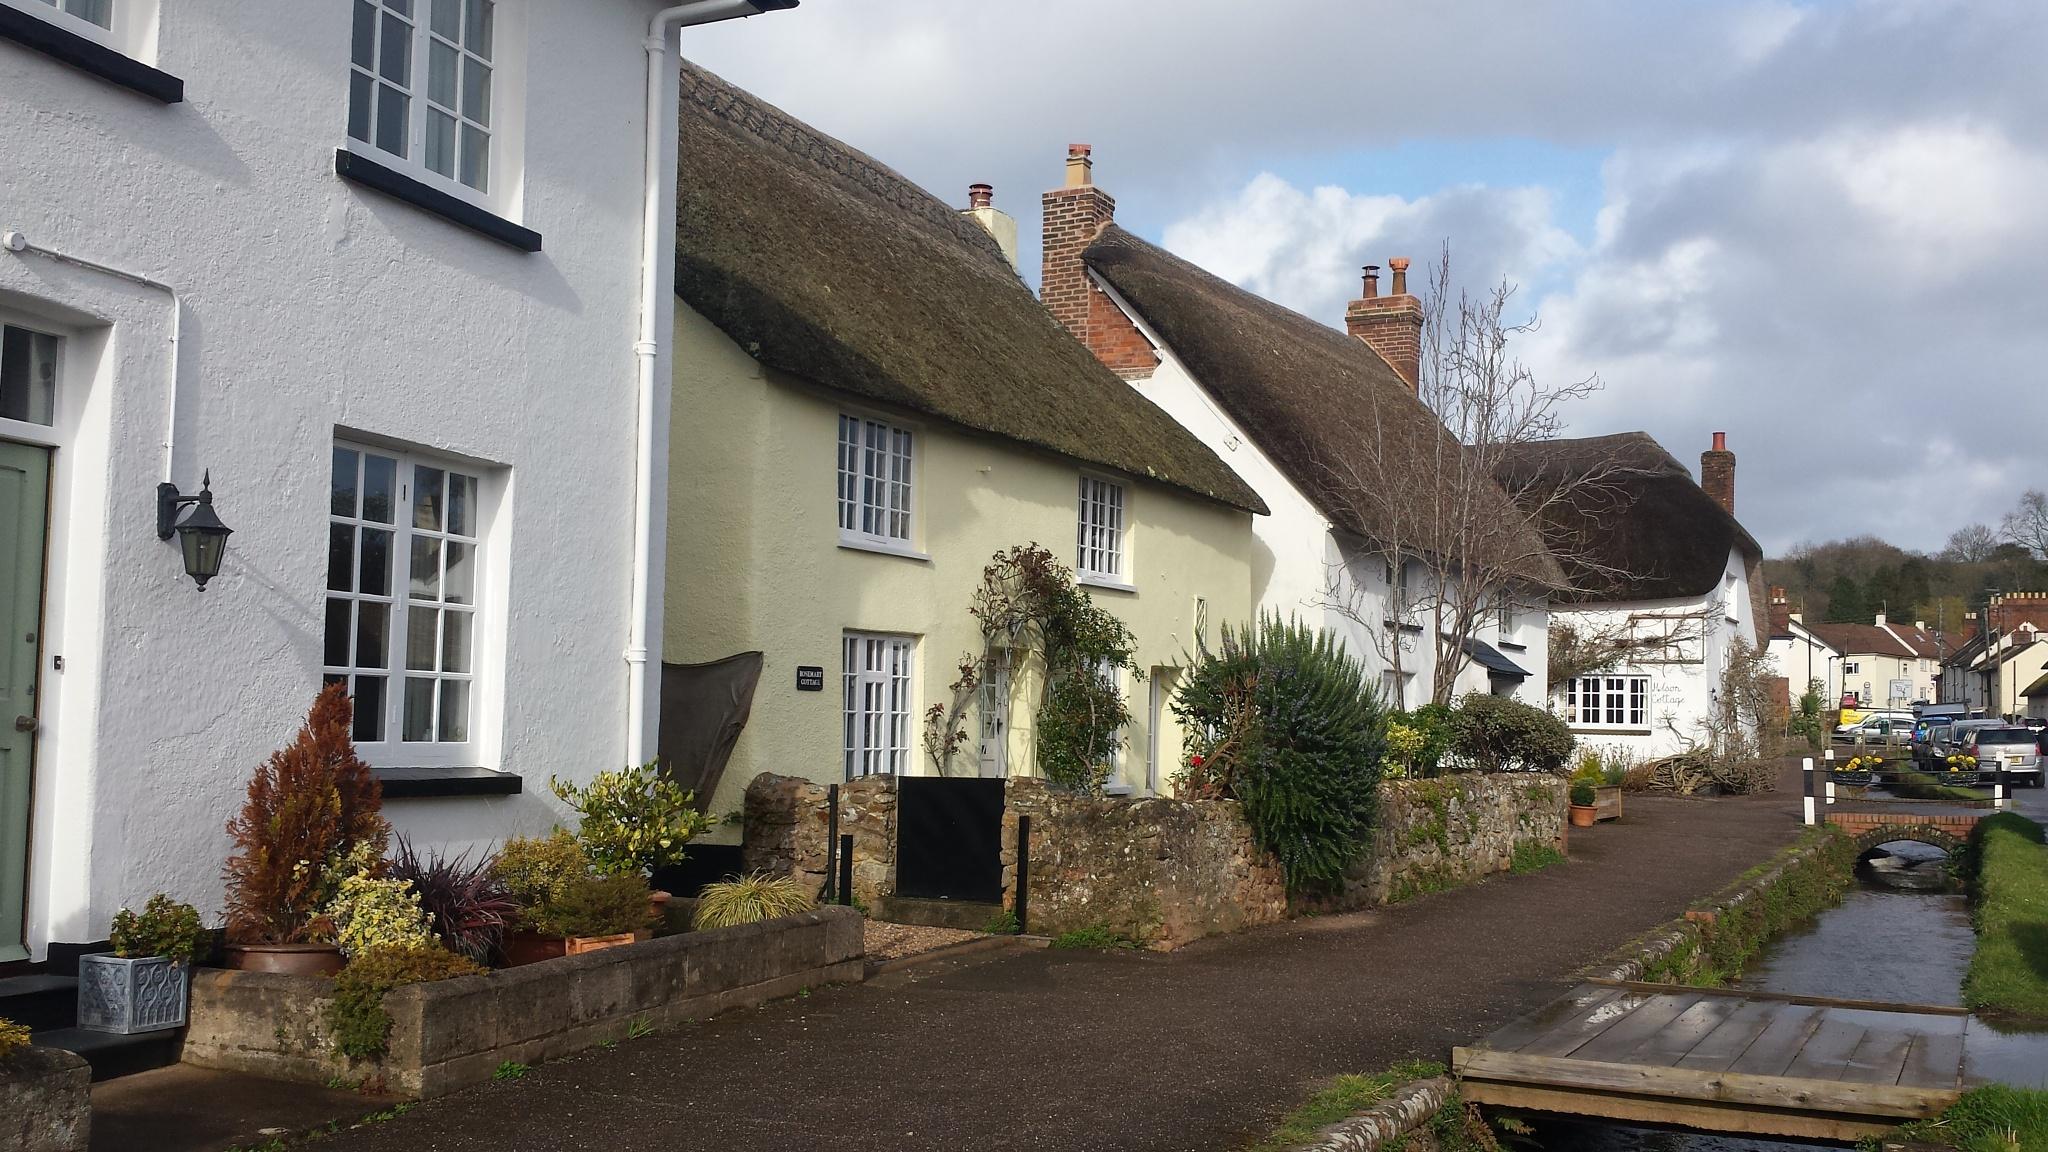 Otterton, Devon UK by chris_ironside